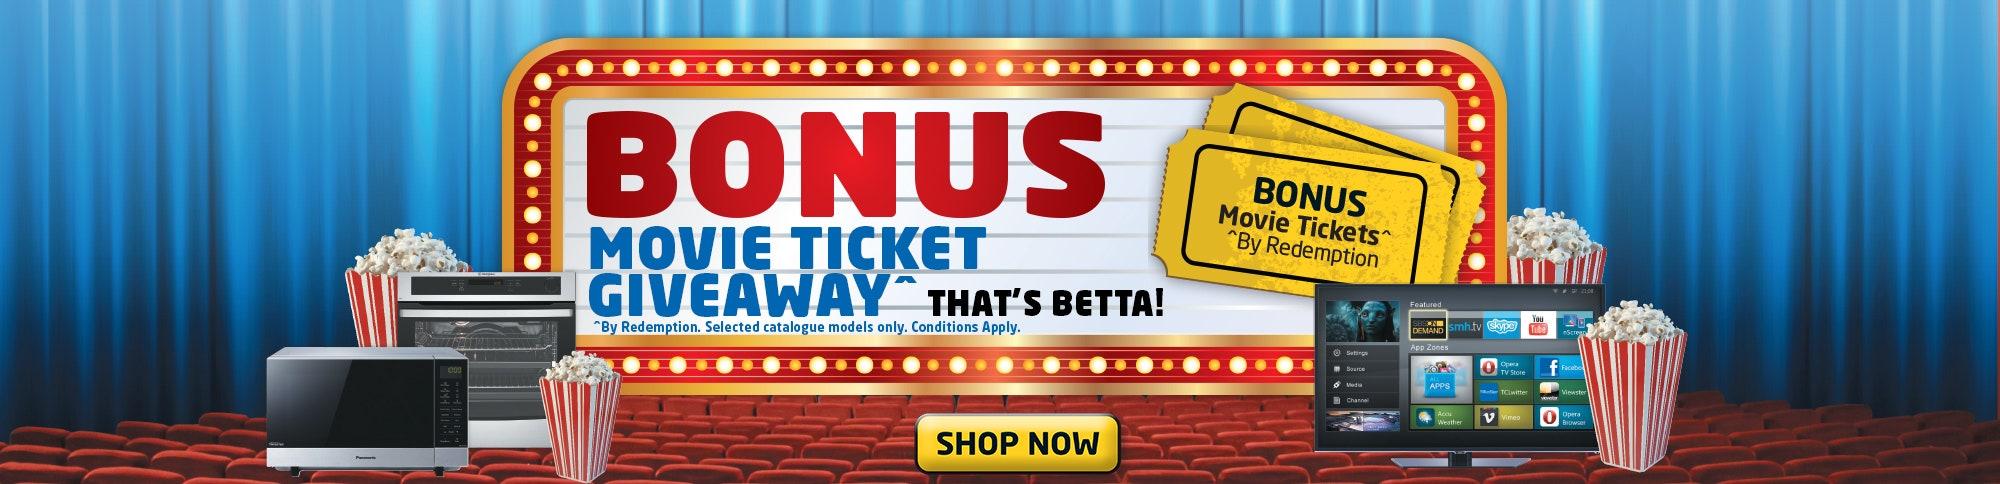 Bonus Movie Ticket Giveaway